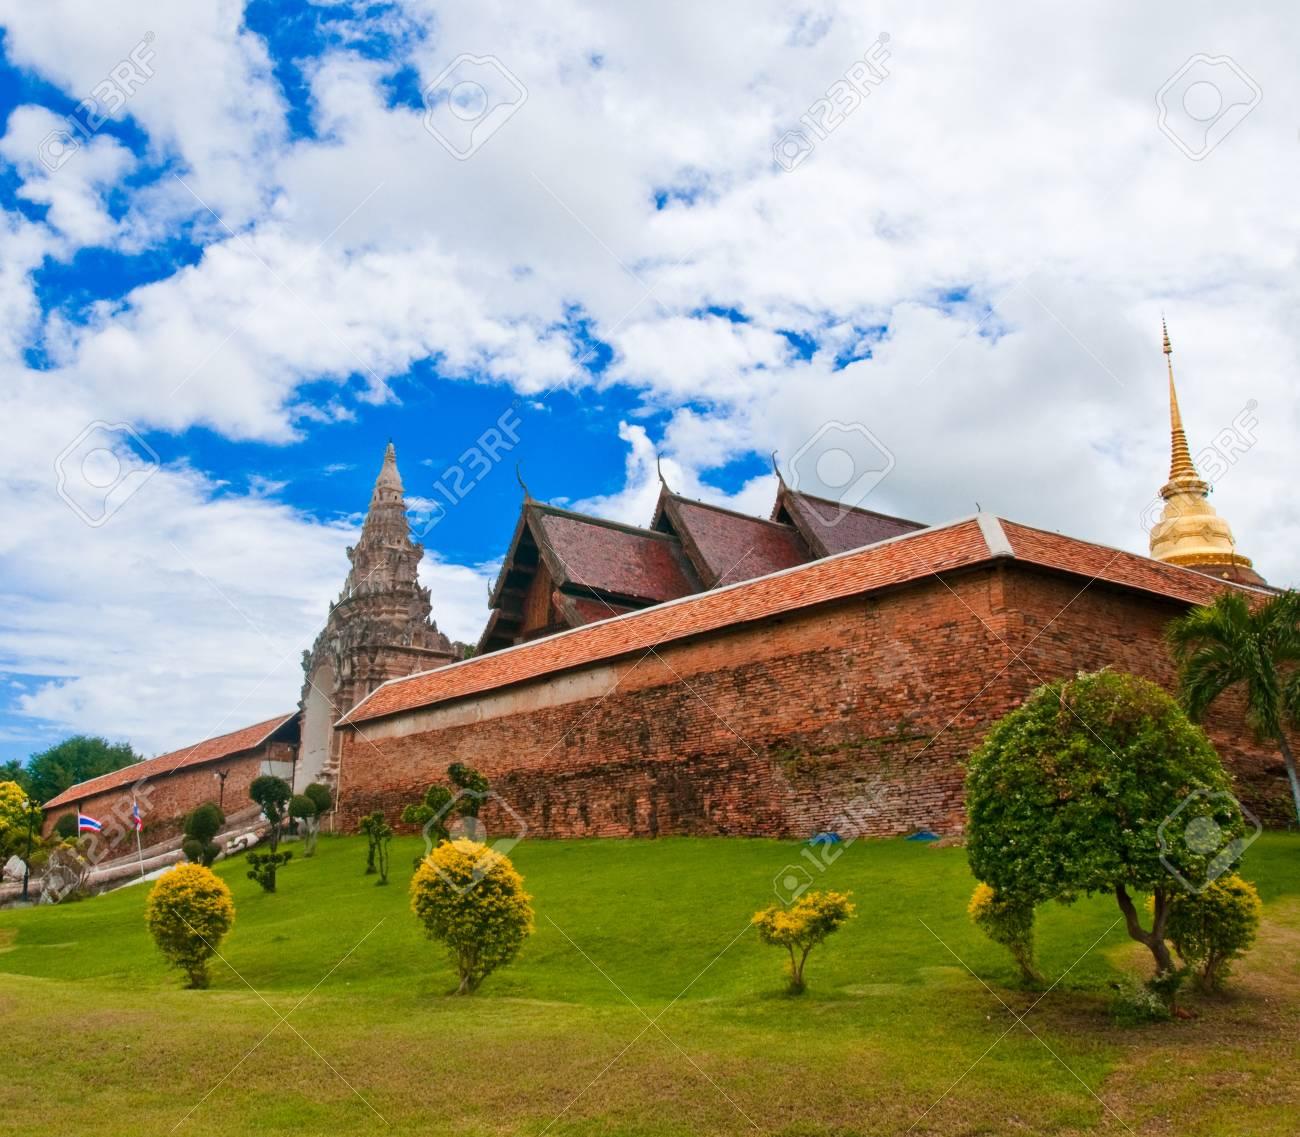 Wat Phra That Lampang Luang in Lampang, Thailand. Stock Photo - 13021286